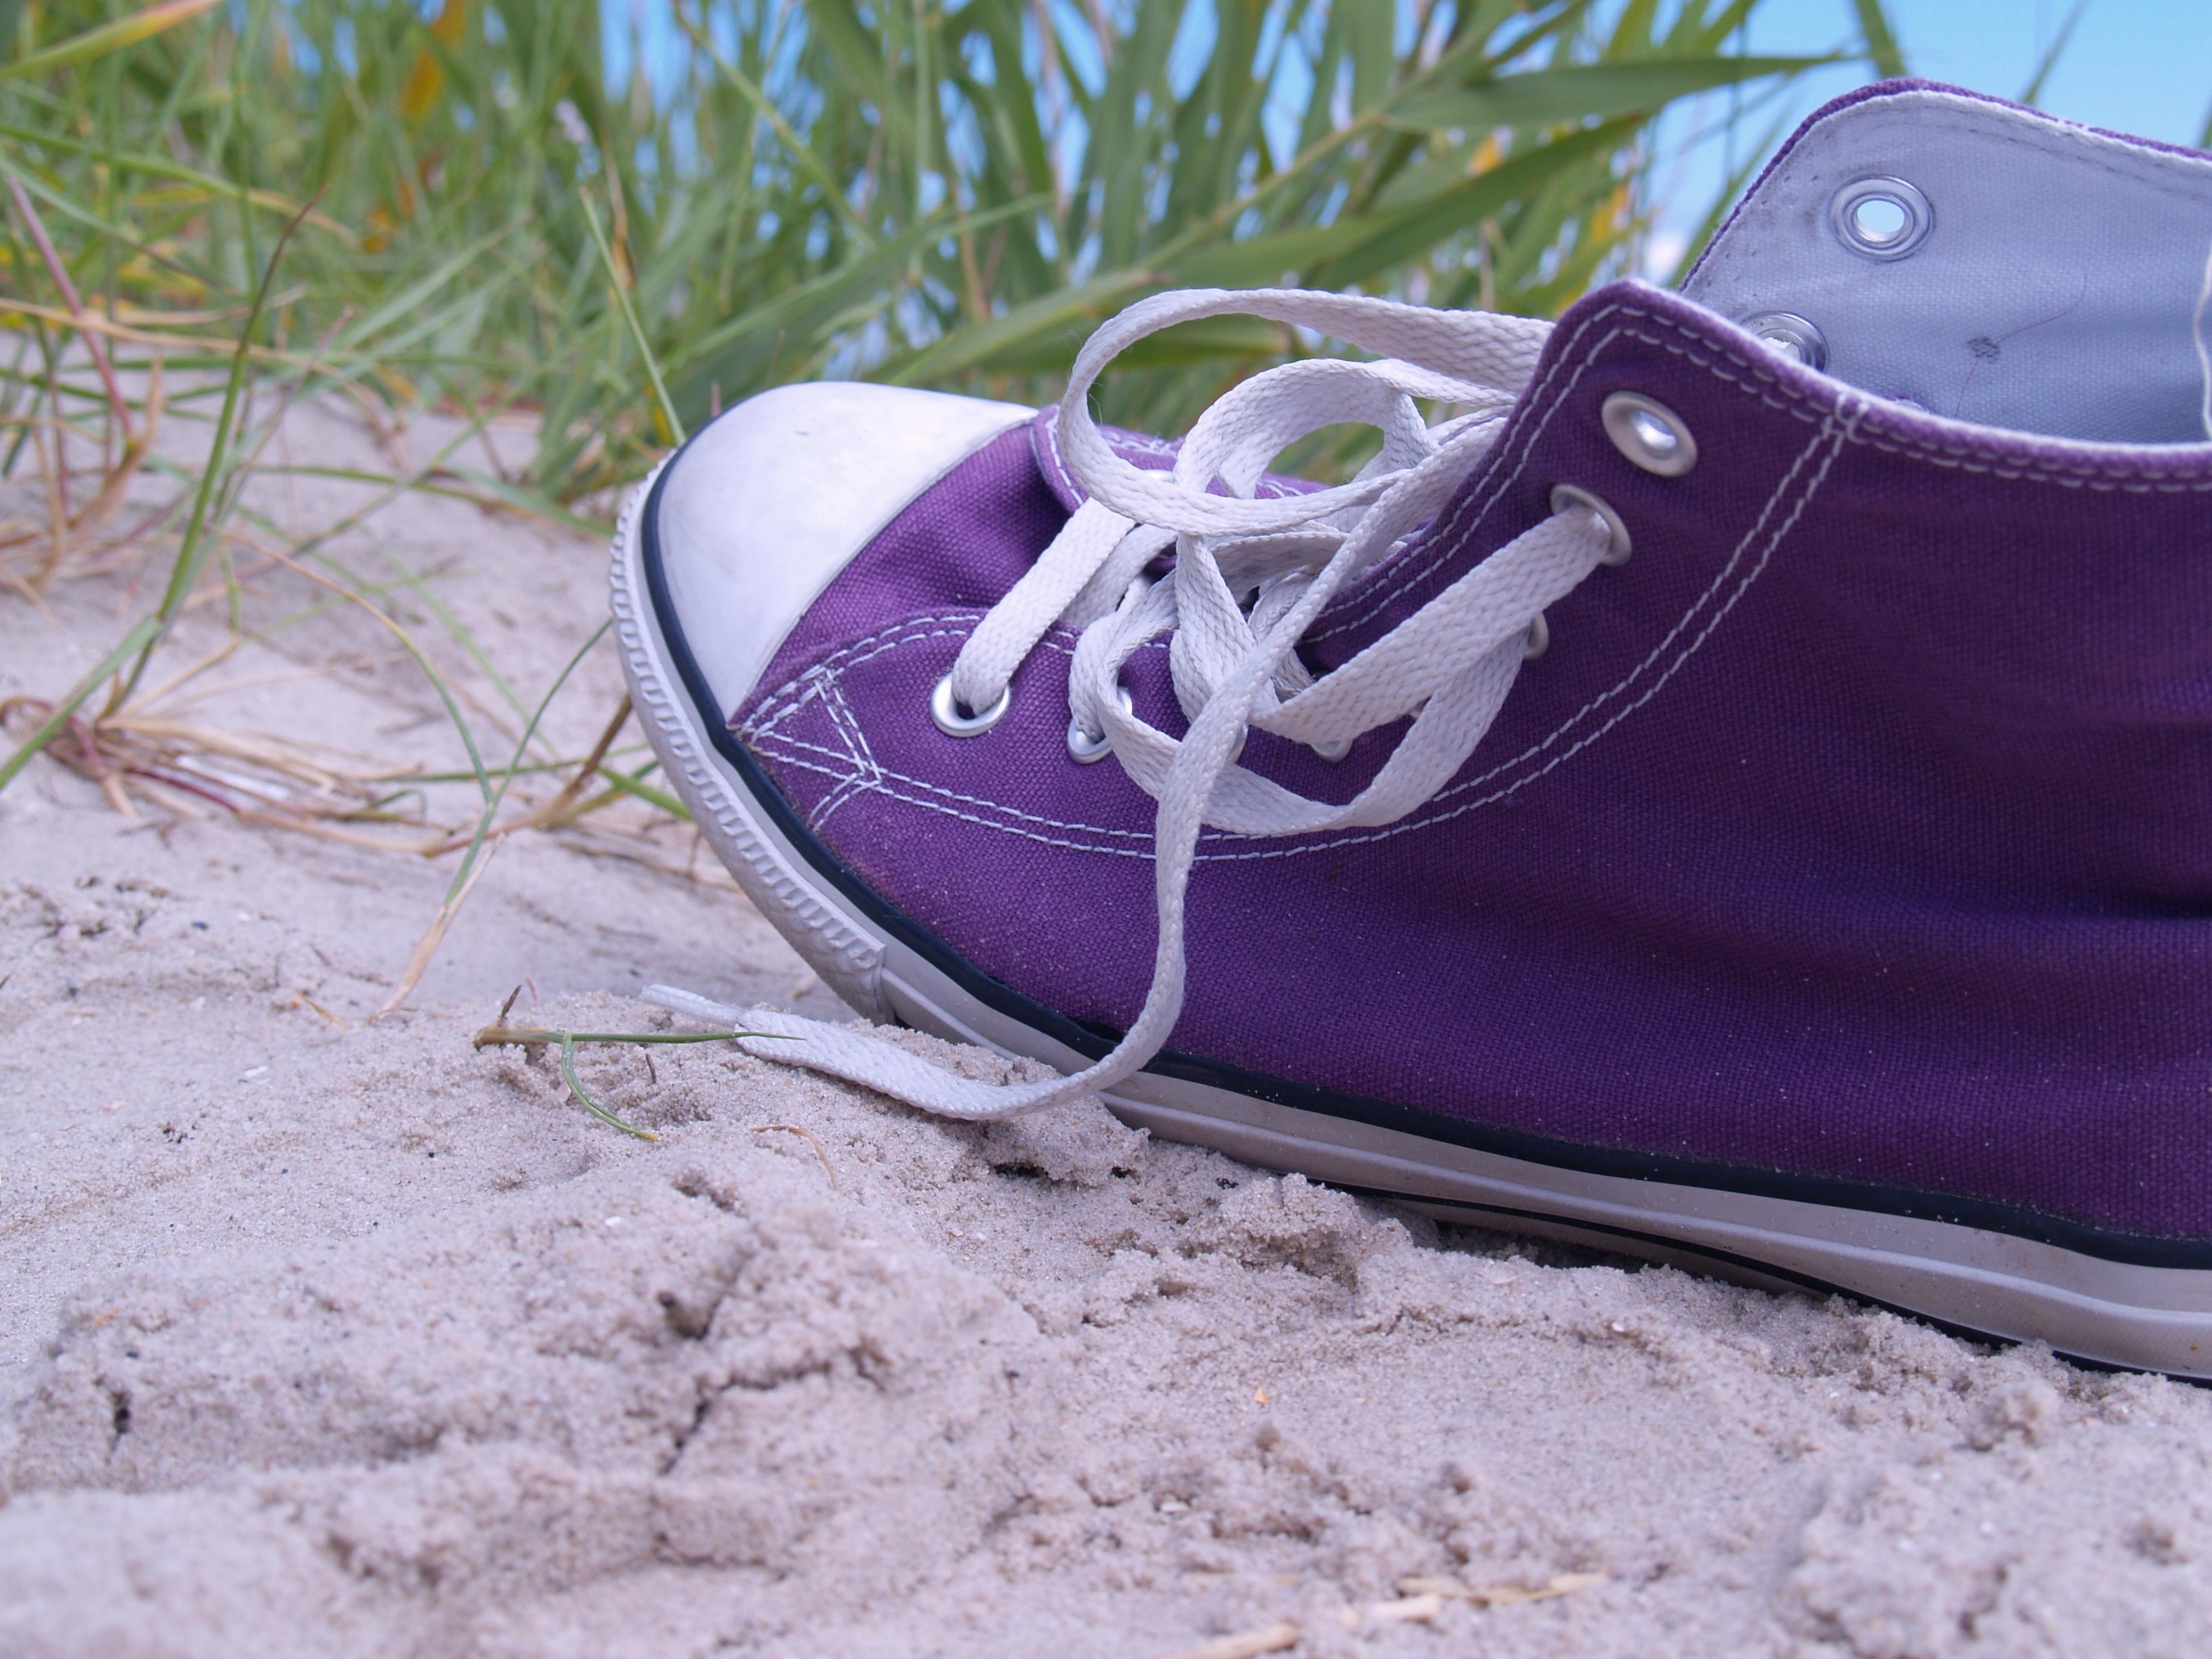 ... kulit, ungu, sneaker, musim semi, hijau, liburan, biru, berwarna merah muda, tali sepatu, kaki ayam, Abu-abu, relaksasi, krem, sepatu kets, berbicara, ...